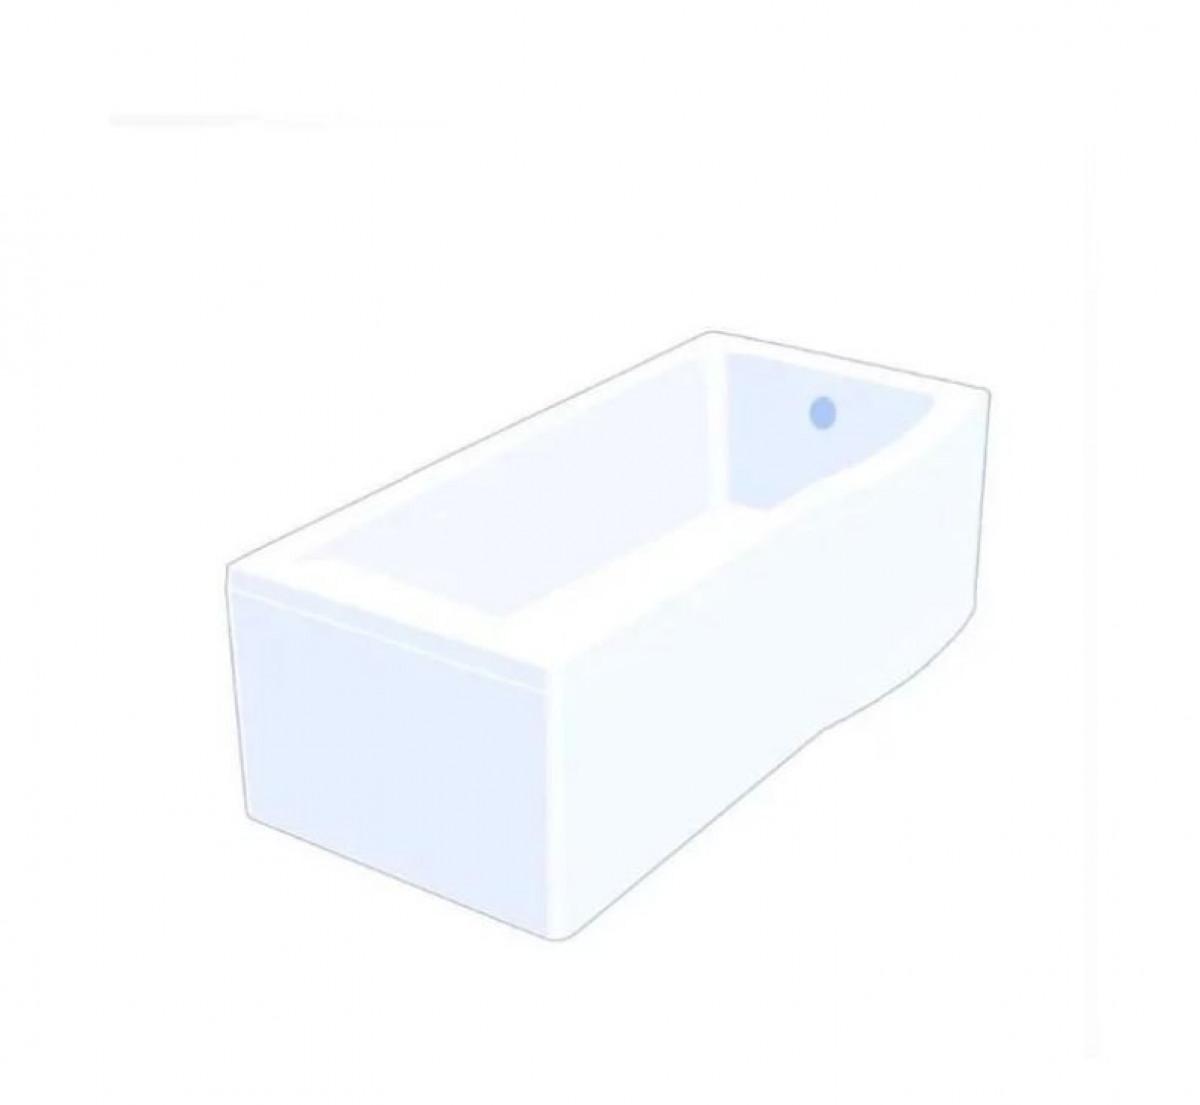 Carron Aspect 1700 X 700 Right Hand Shower Bath Q4 02025